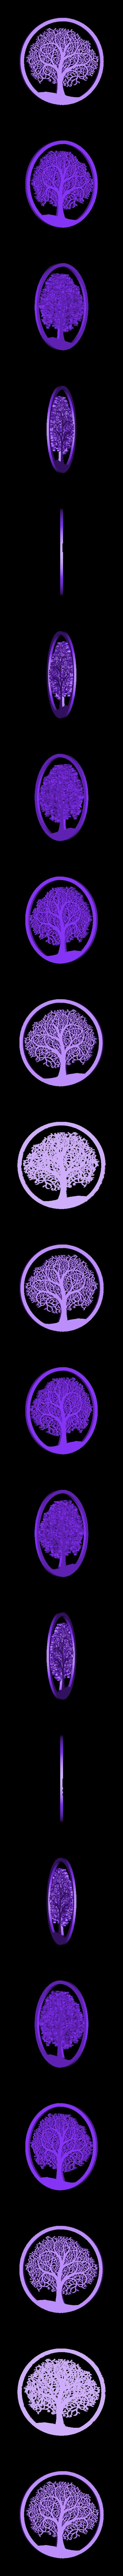 encircled_tree_v2.stl Download free STL file Encircled Tree • 3D printing object, FrankLumien